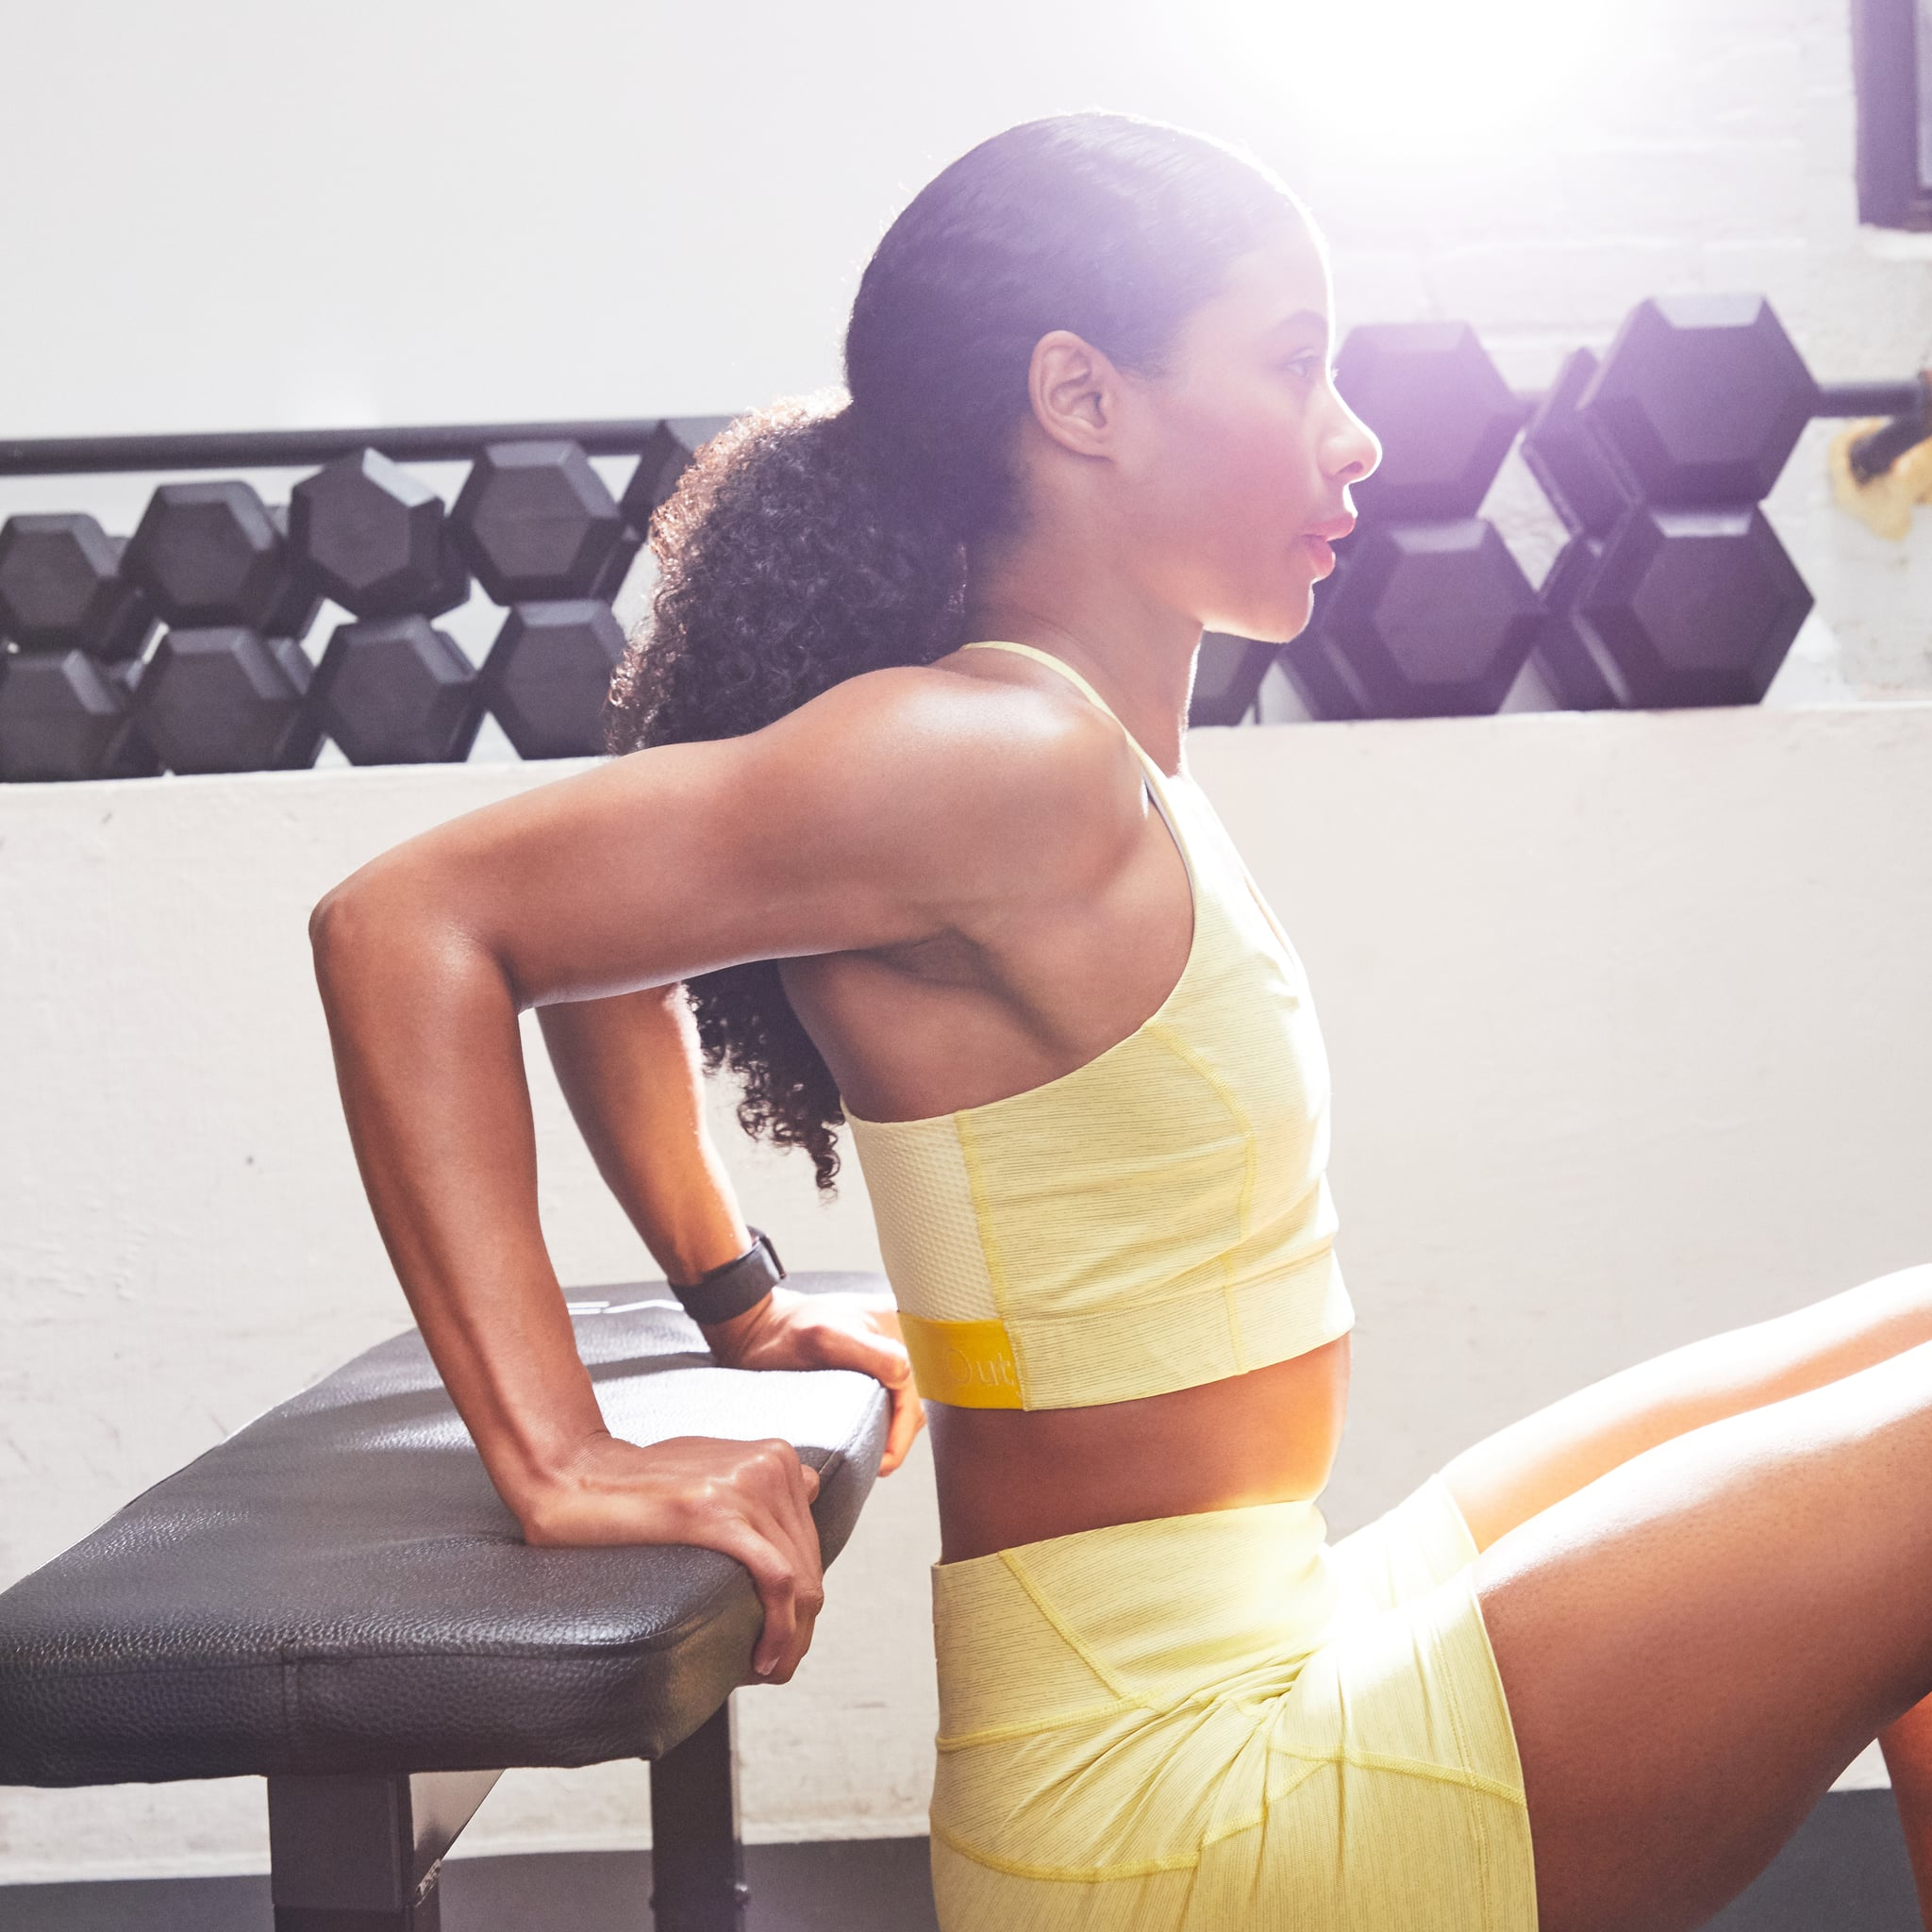 Dumbbell Back And Arm Exercises Popsugar Fitness